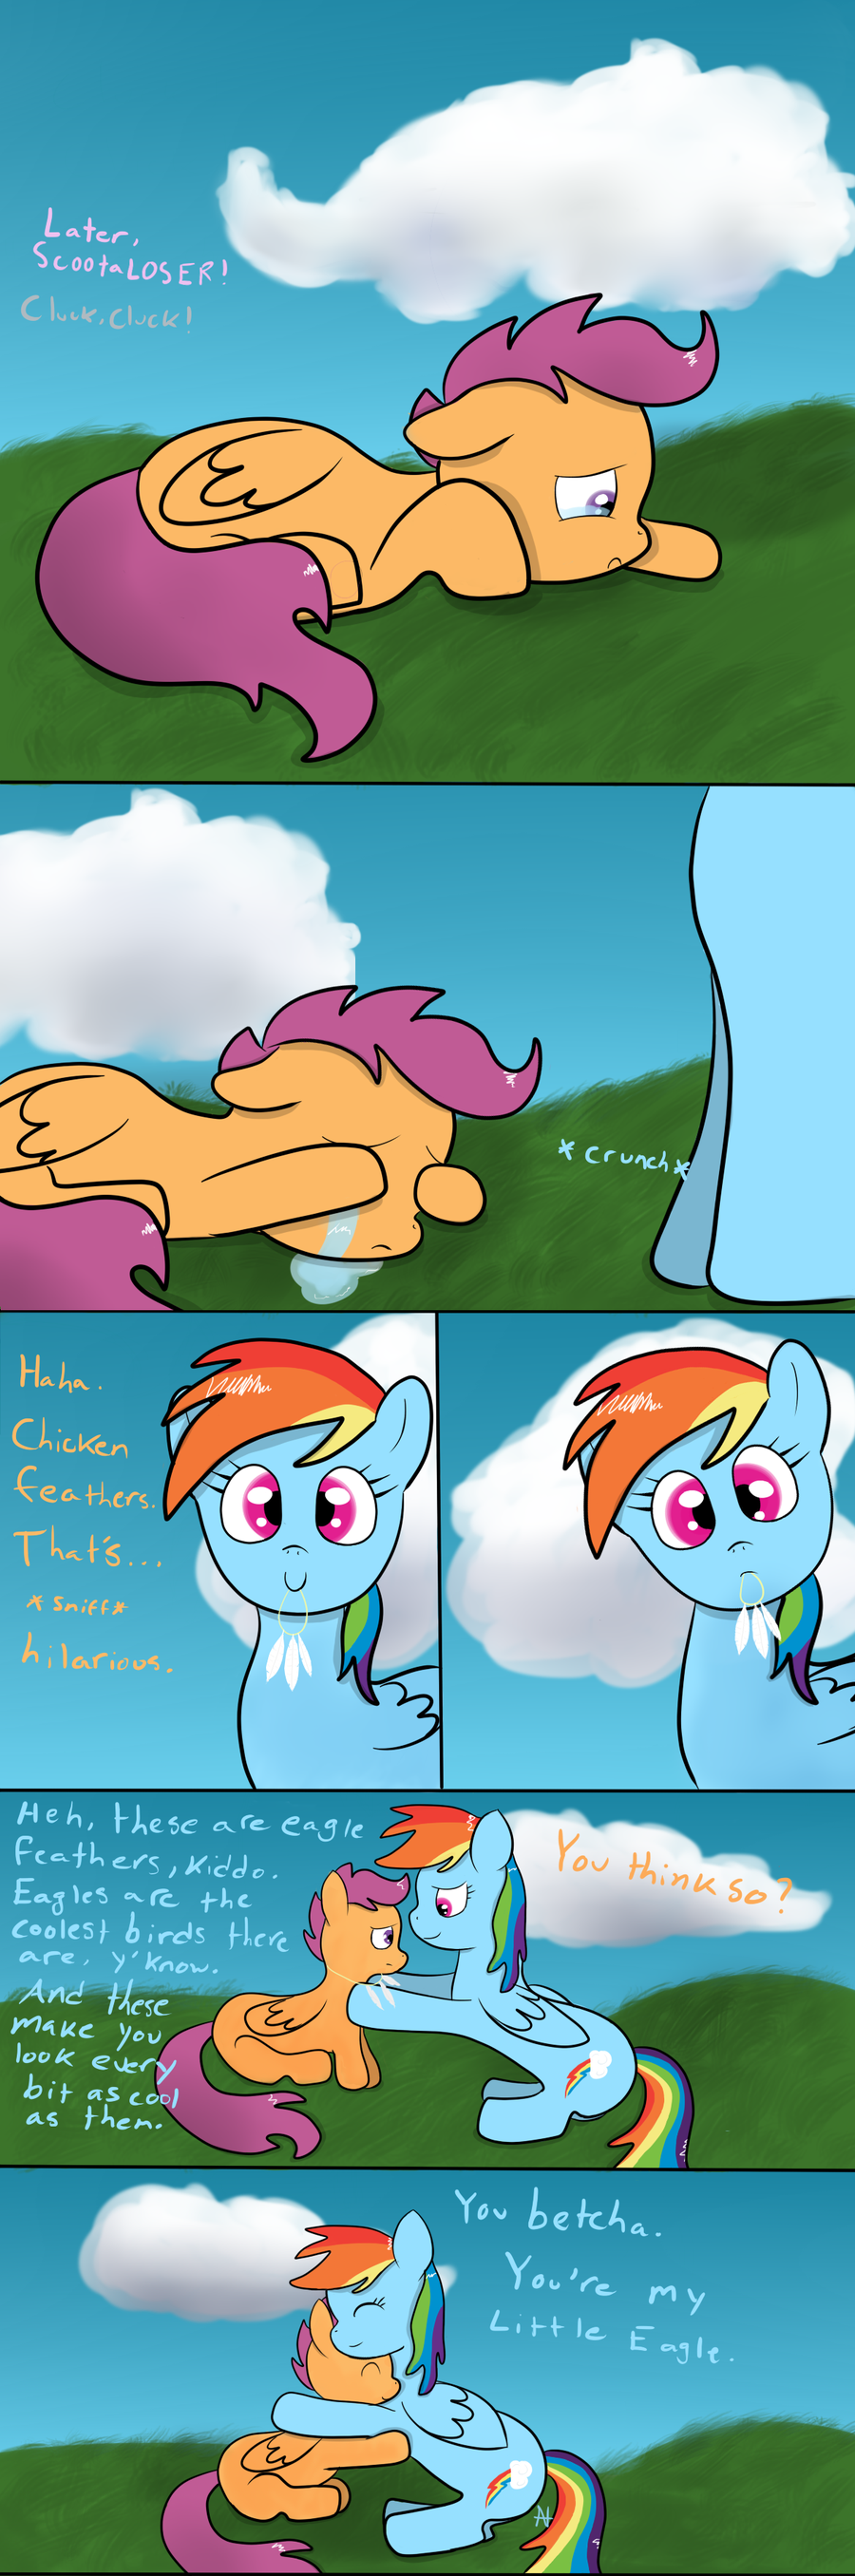 Human Applejack And Rainbow Dash Rainbow Dash And Applejack R34